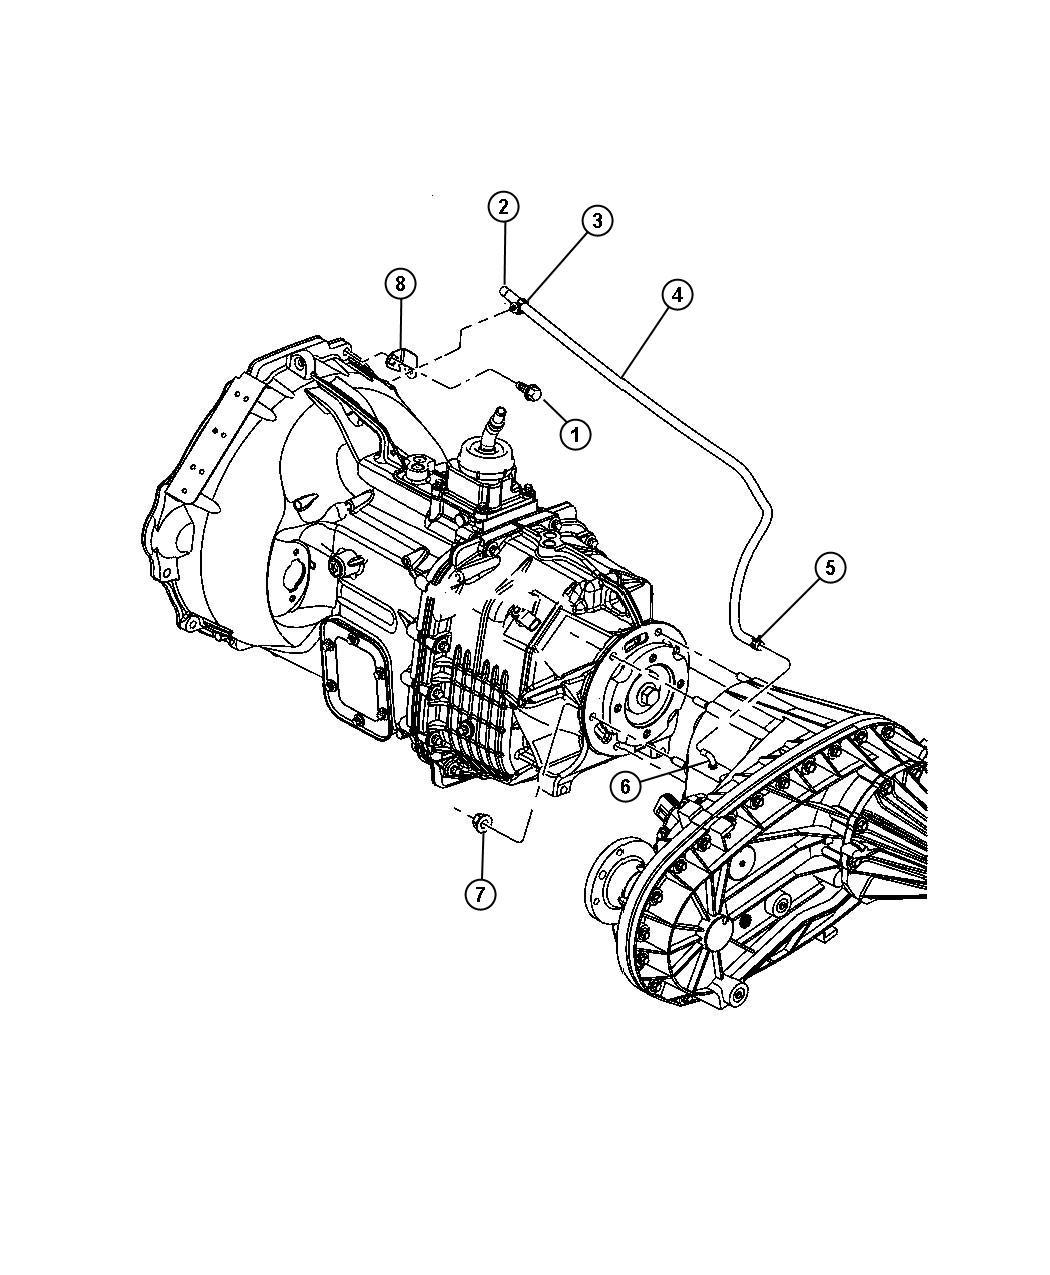 hight resolution of transfer case wiring harness 2007 dodge ram 1500 48 dodge ram 1500 vacuum diagram 1997 dodge